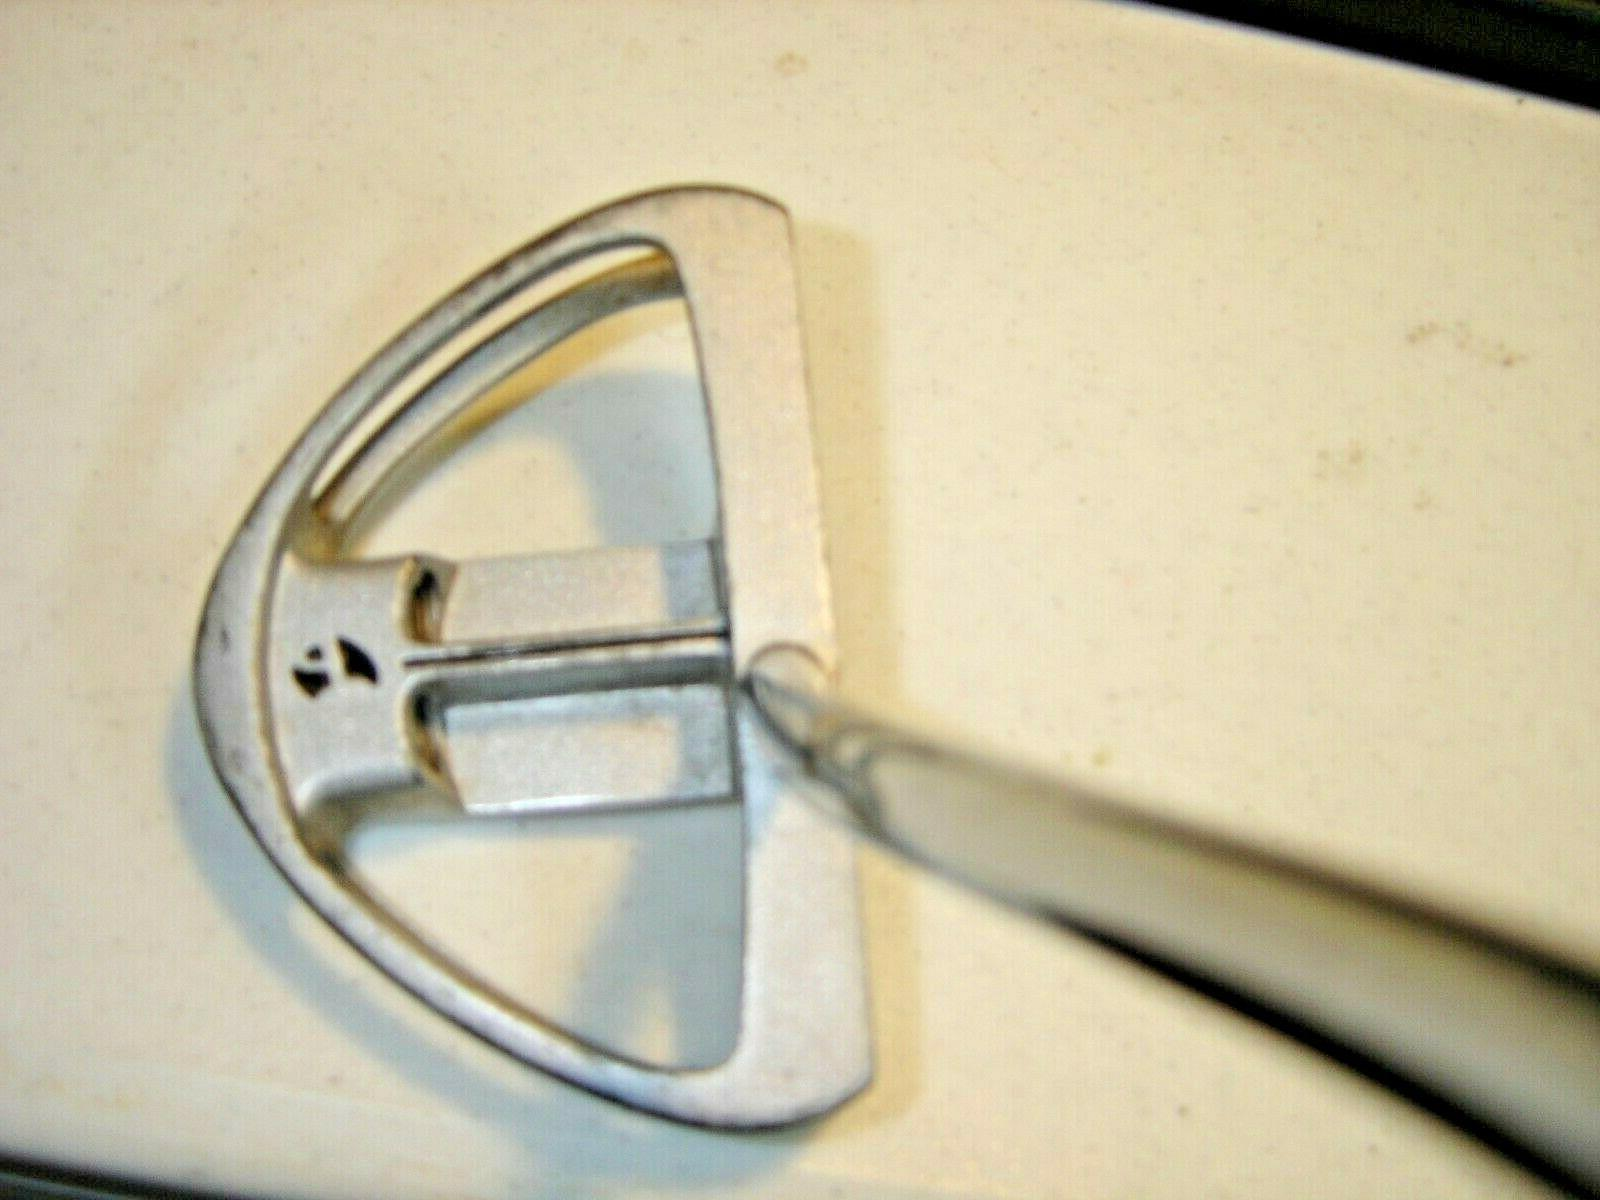 M1 Golf Putter/Steel Shaft/Wrap Grip/Very Good Condition